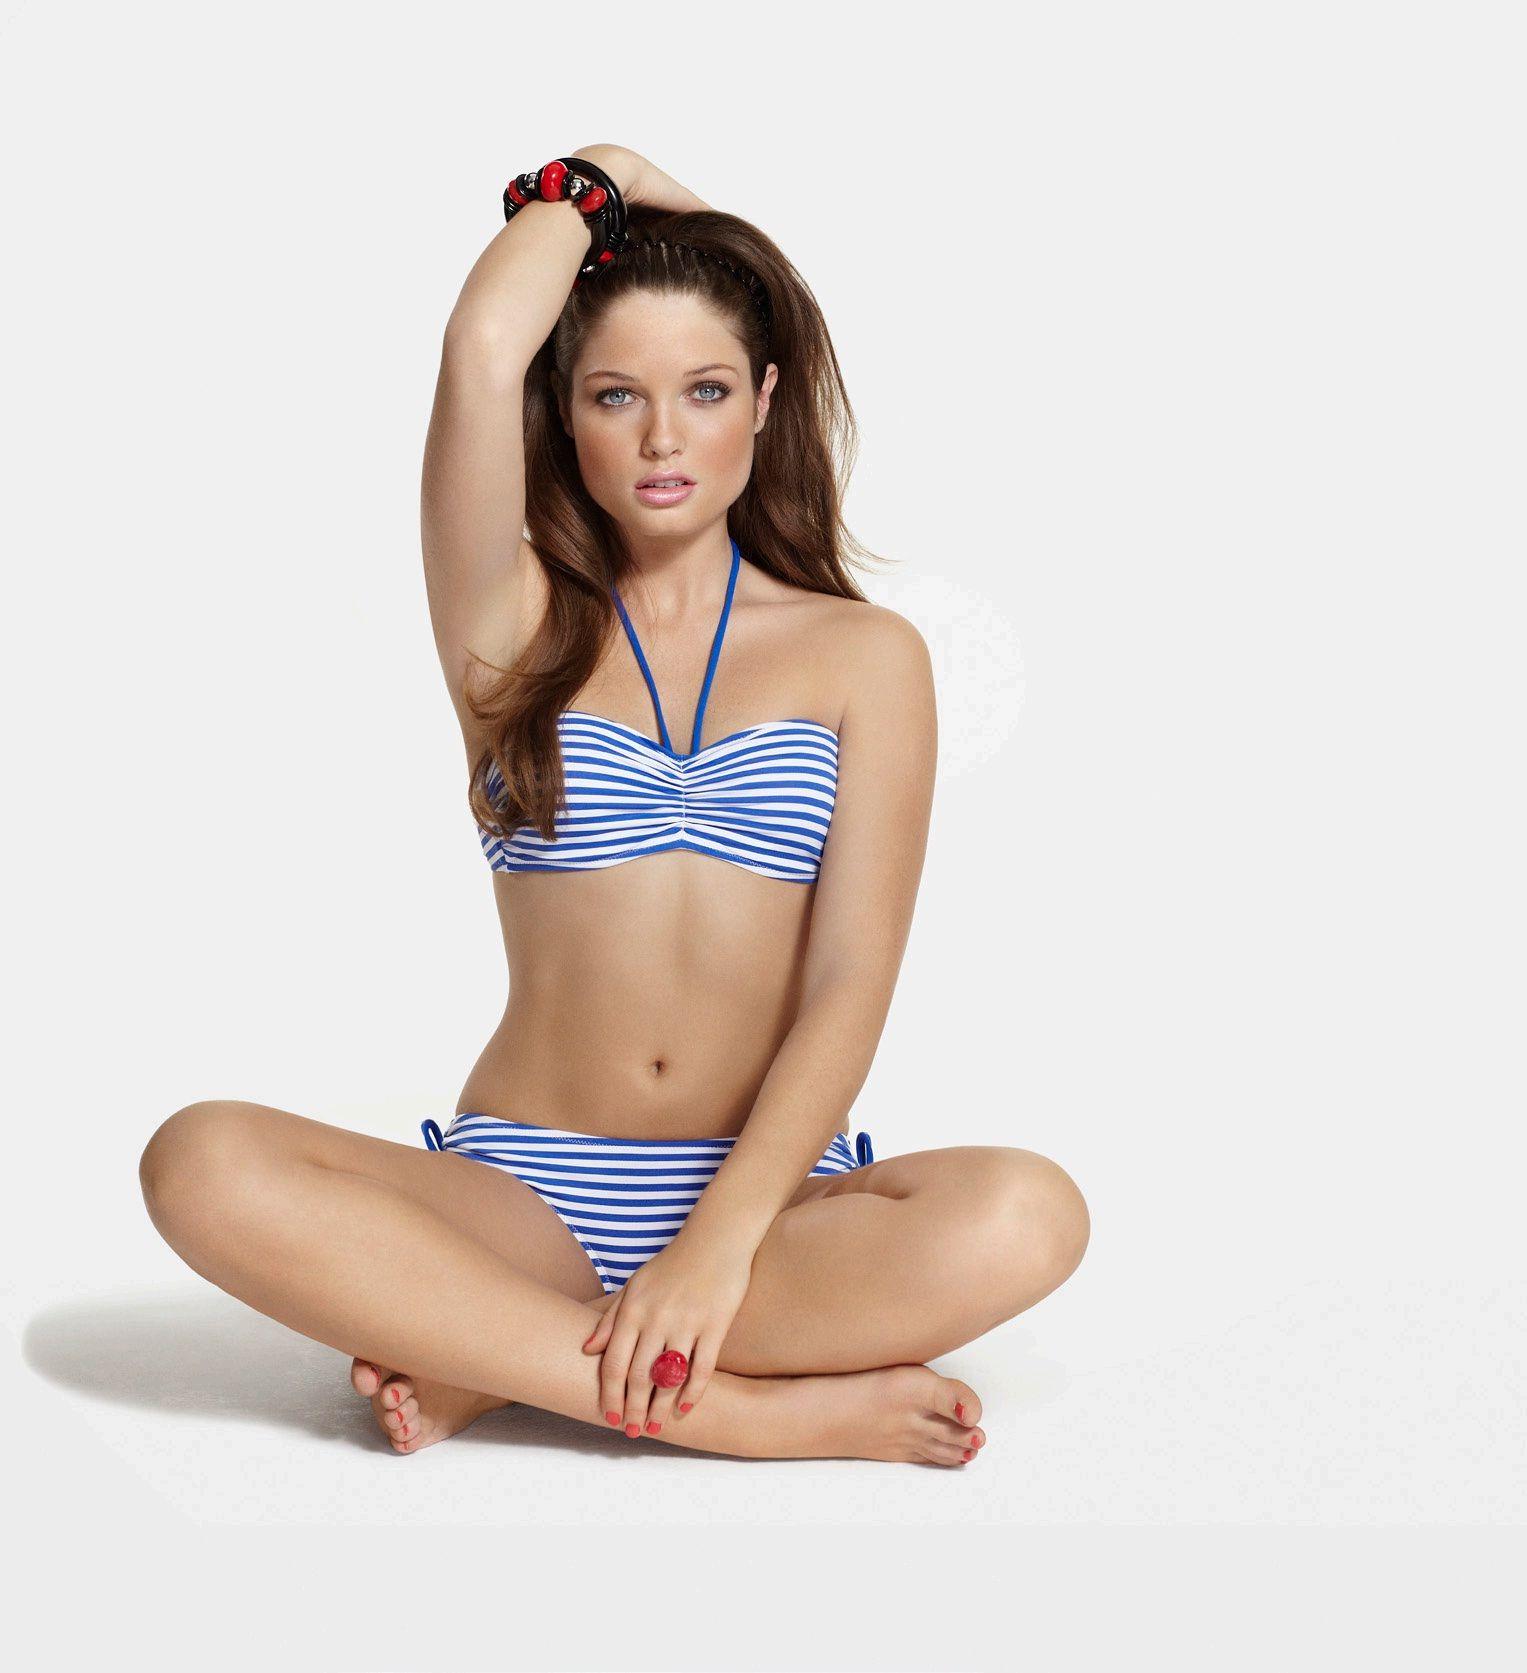 Milana Vayntrub Bikini   25 Photos of Beautiful Swedish Model Sandrah Hellberg   Misc. Things ...